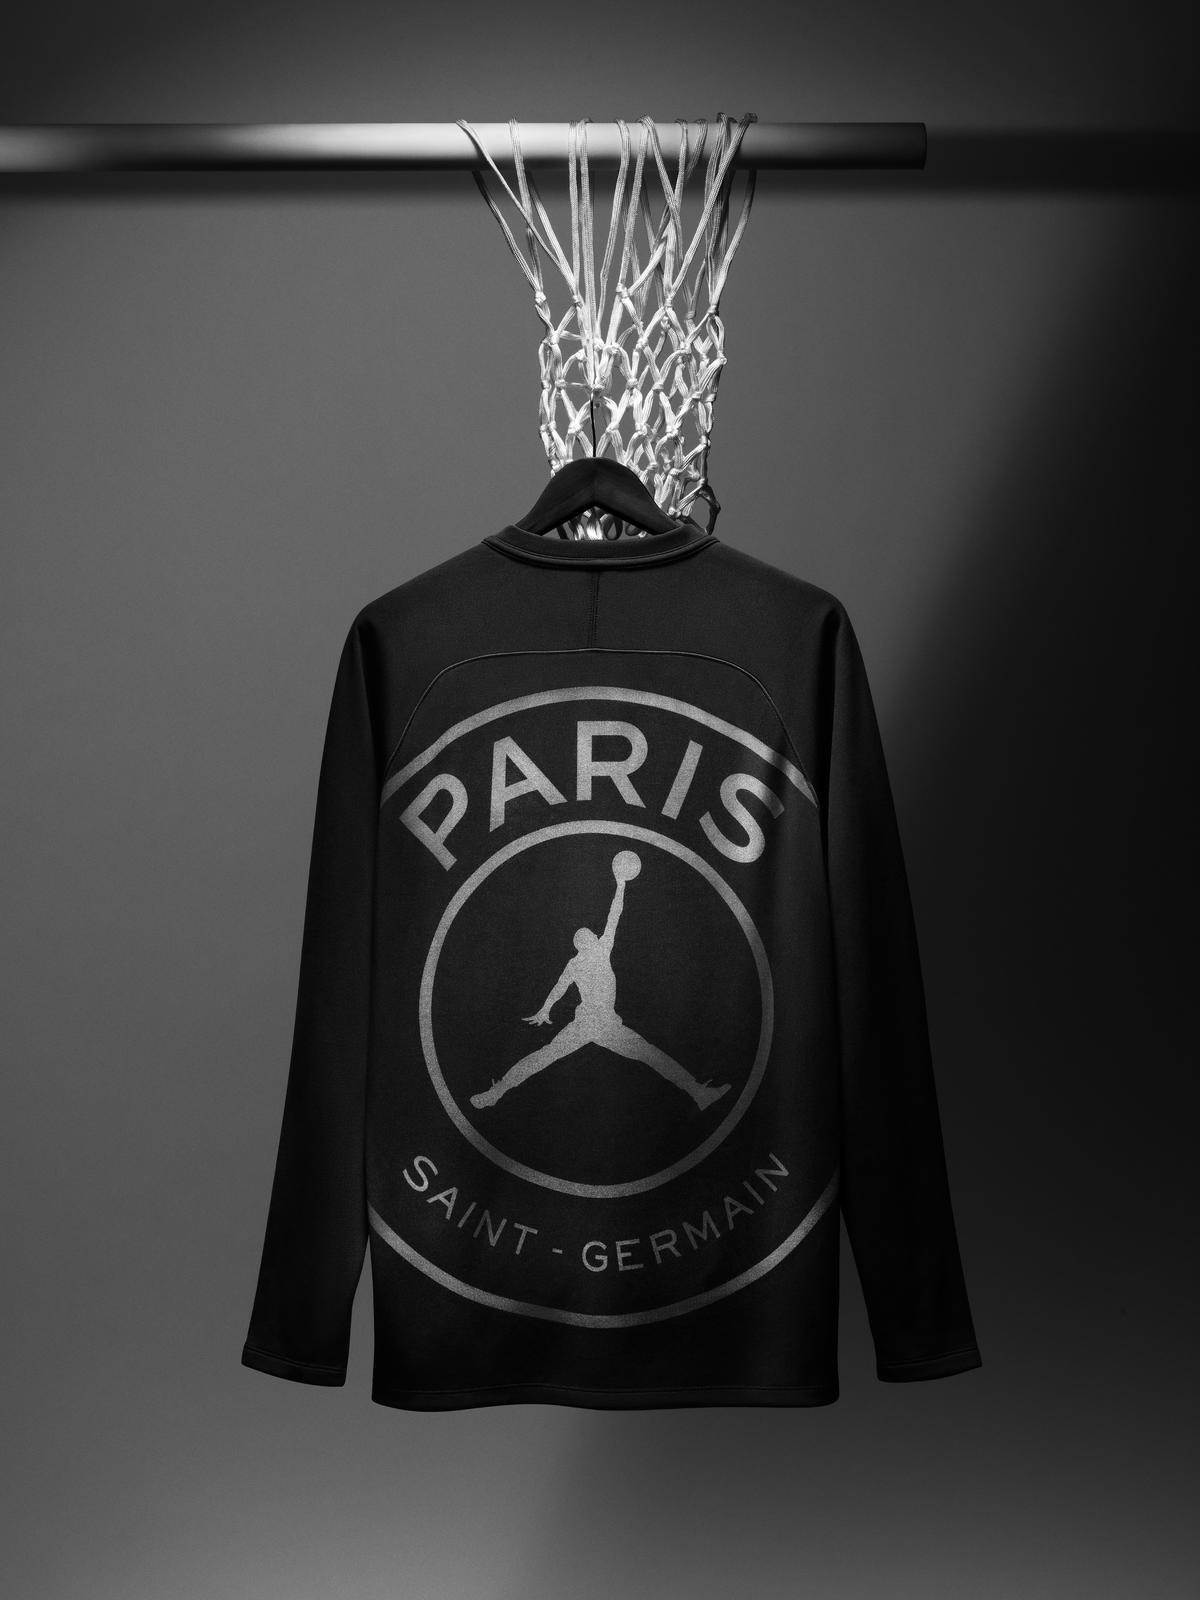 Jordan_Brand__Paris_Saint-Germain_as_its_First-Ever_Football_Club_Soccer_29_81741